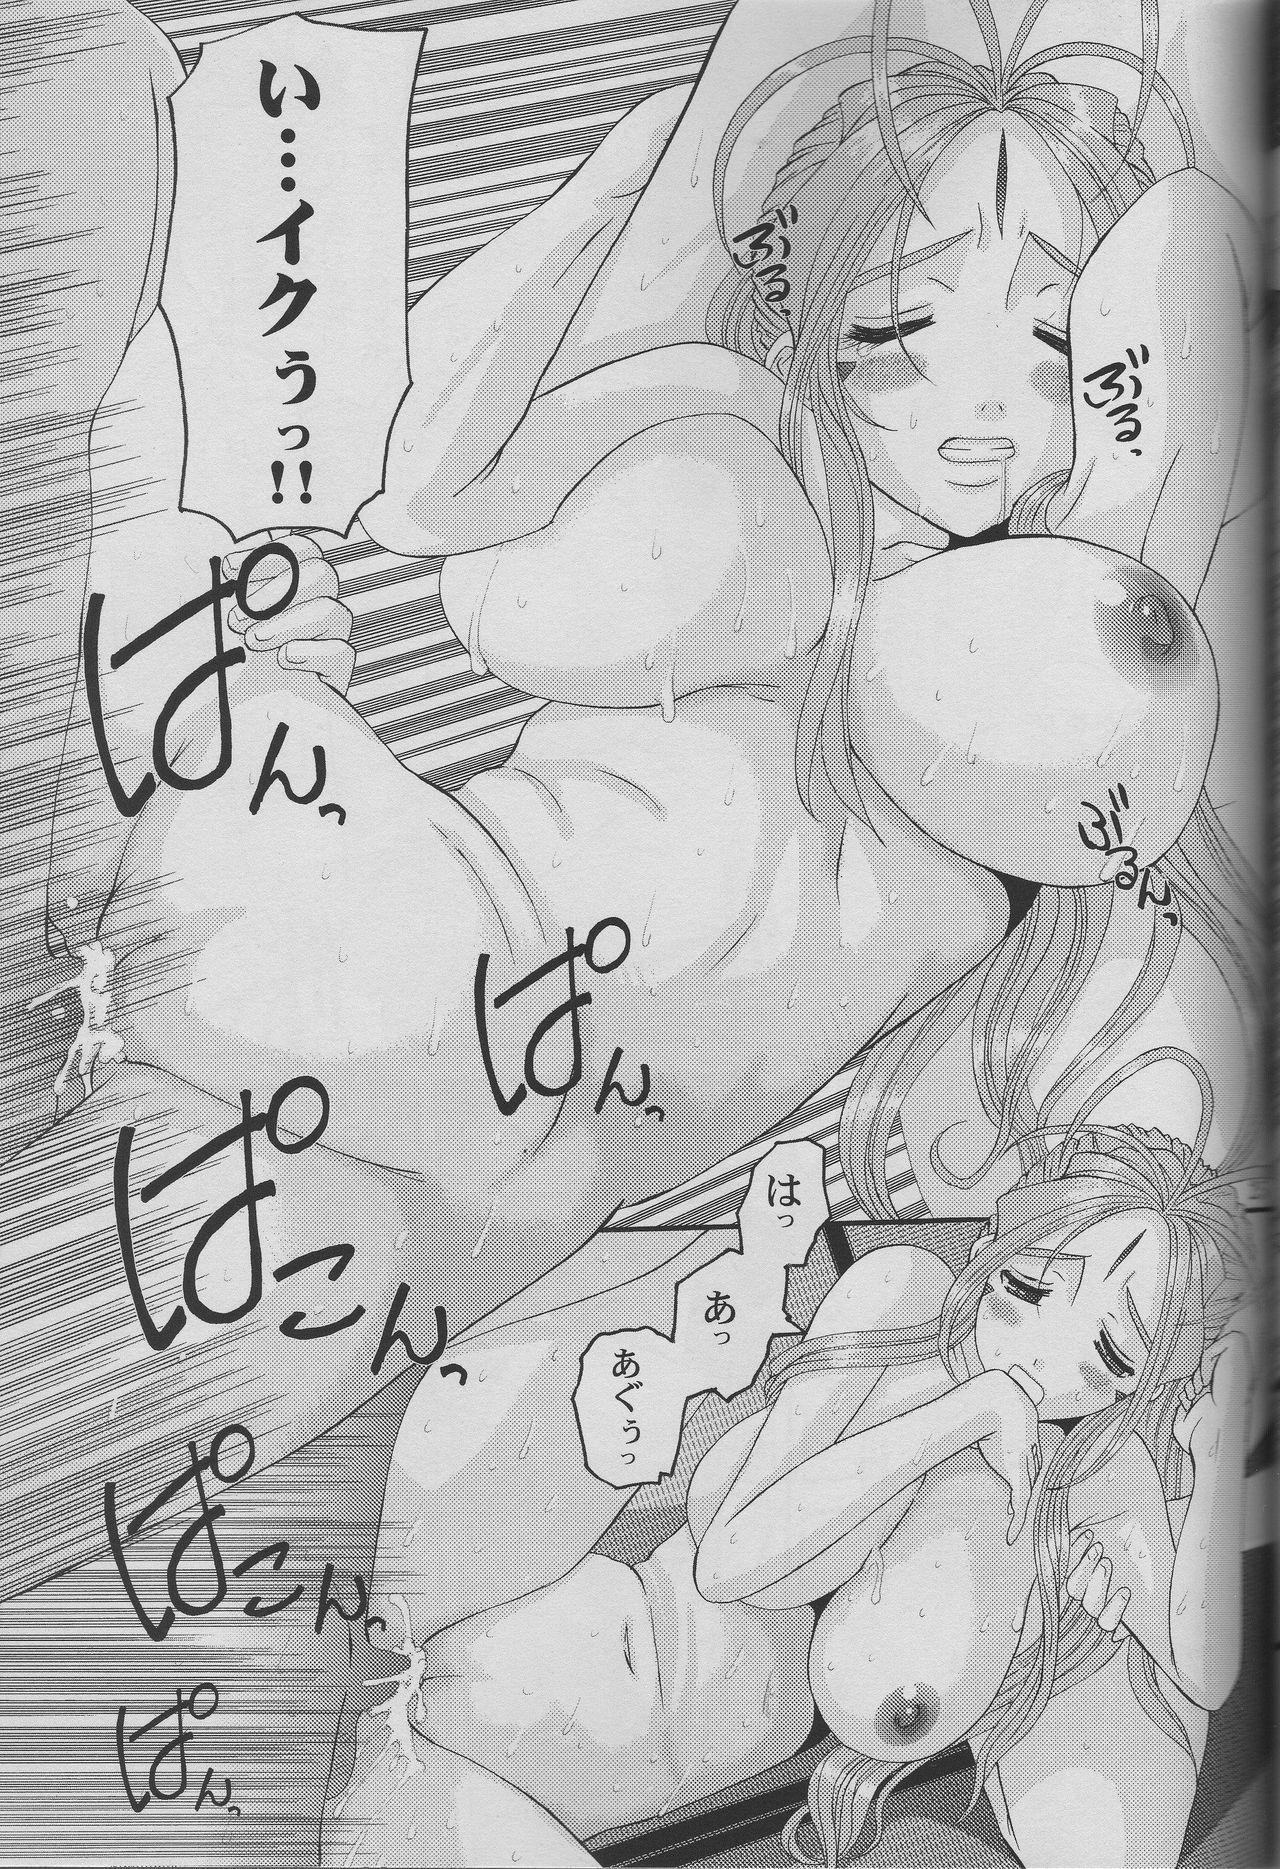 Nightmare of My Goddess Vol. 9 23